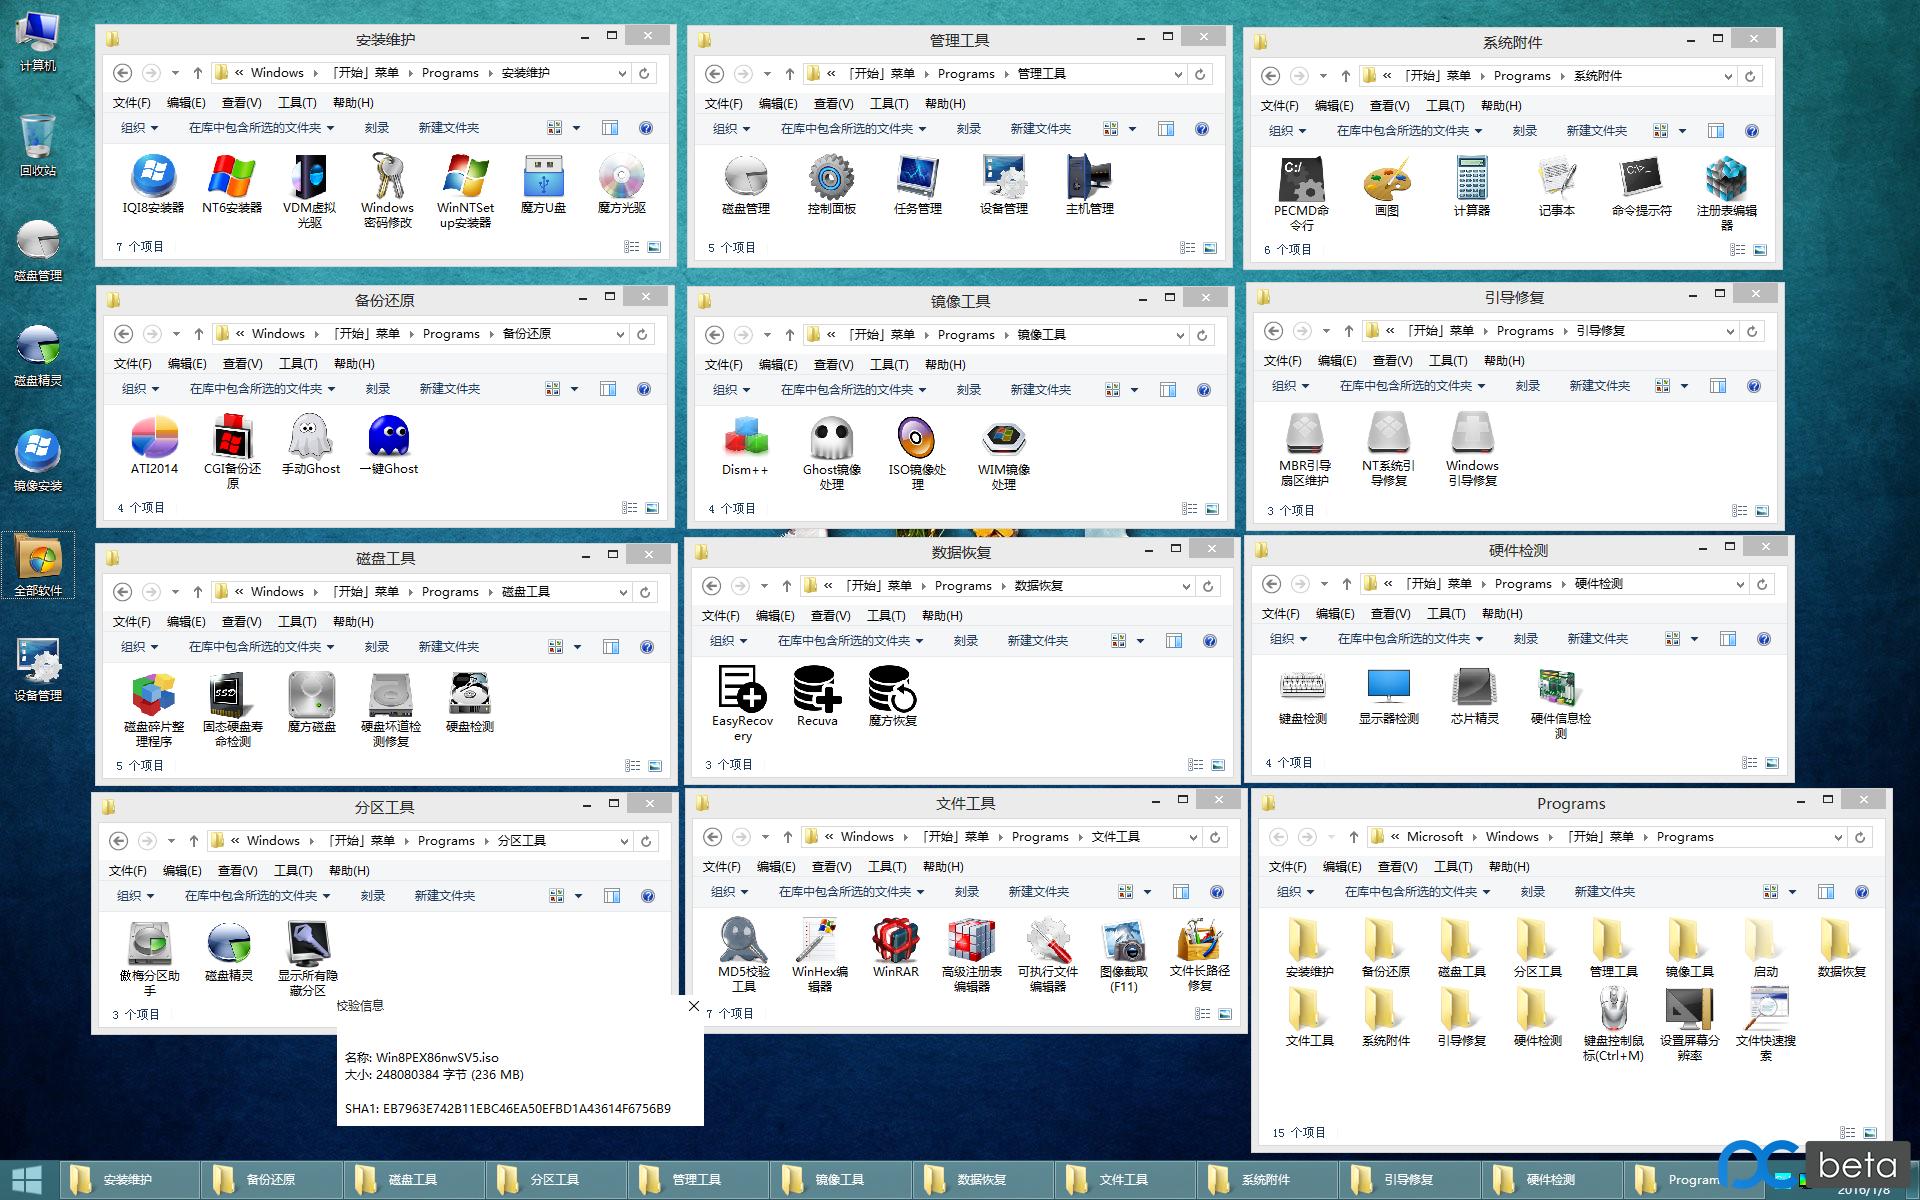 Win8PE X86 女娲基础维护版V5.png